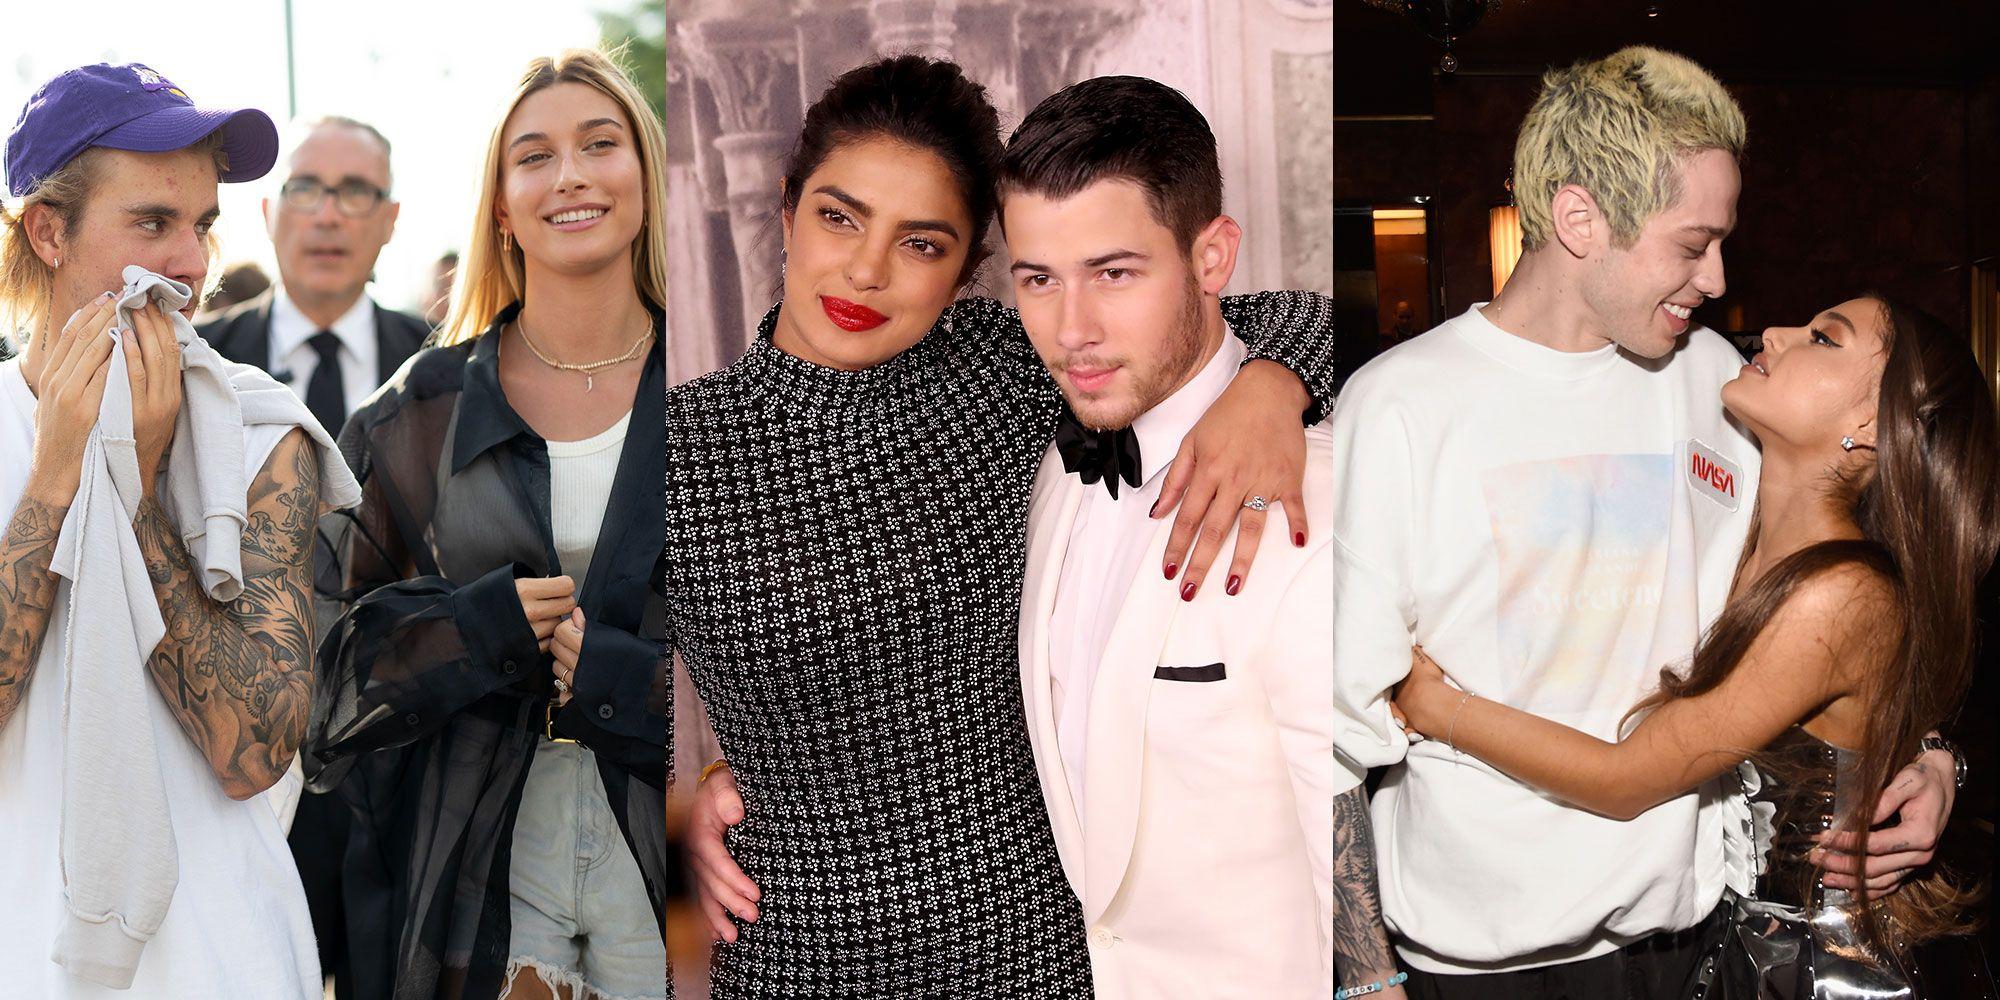 Hailey Baldwin and Justin Bieber, Priyanka Chopra and Nick Jonas, and Pete Davidson and Ariana Grande